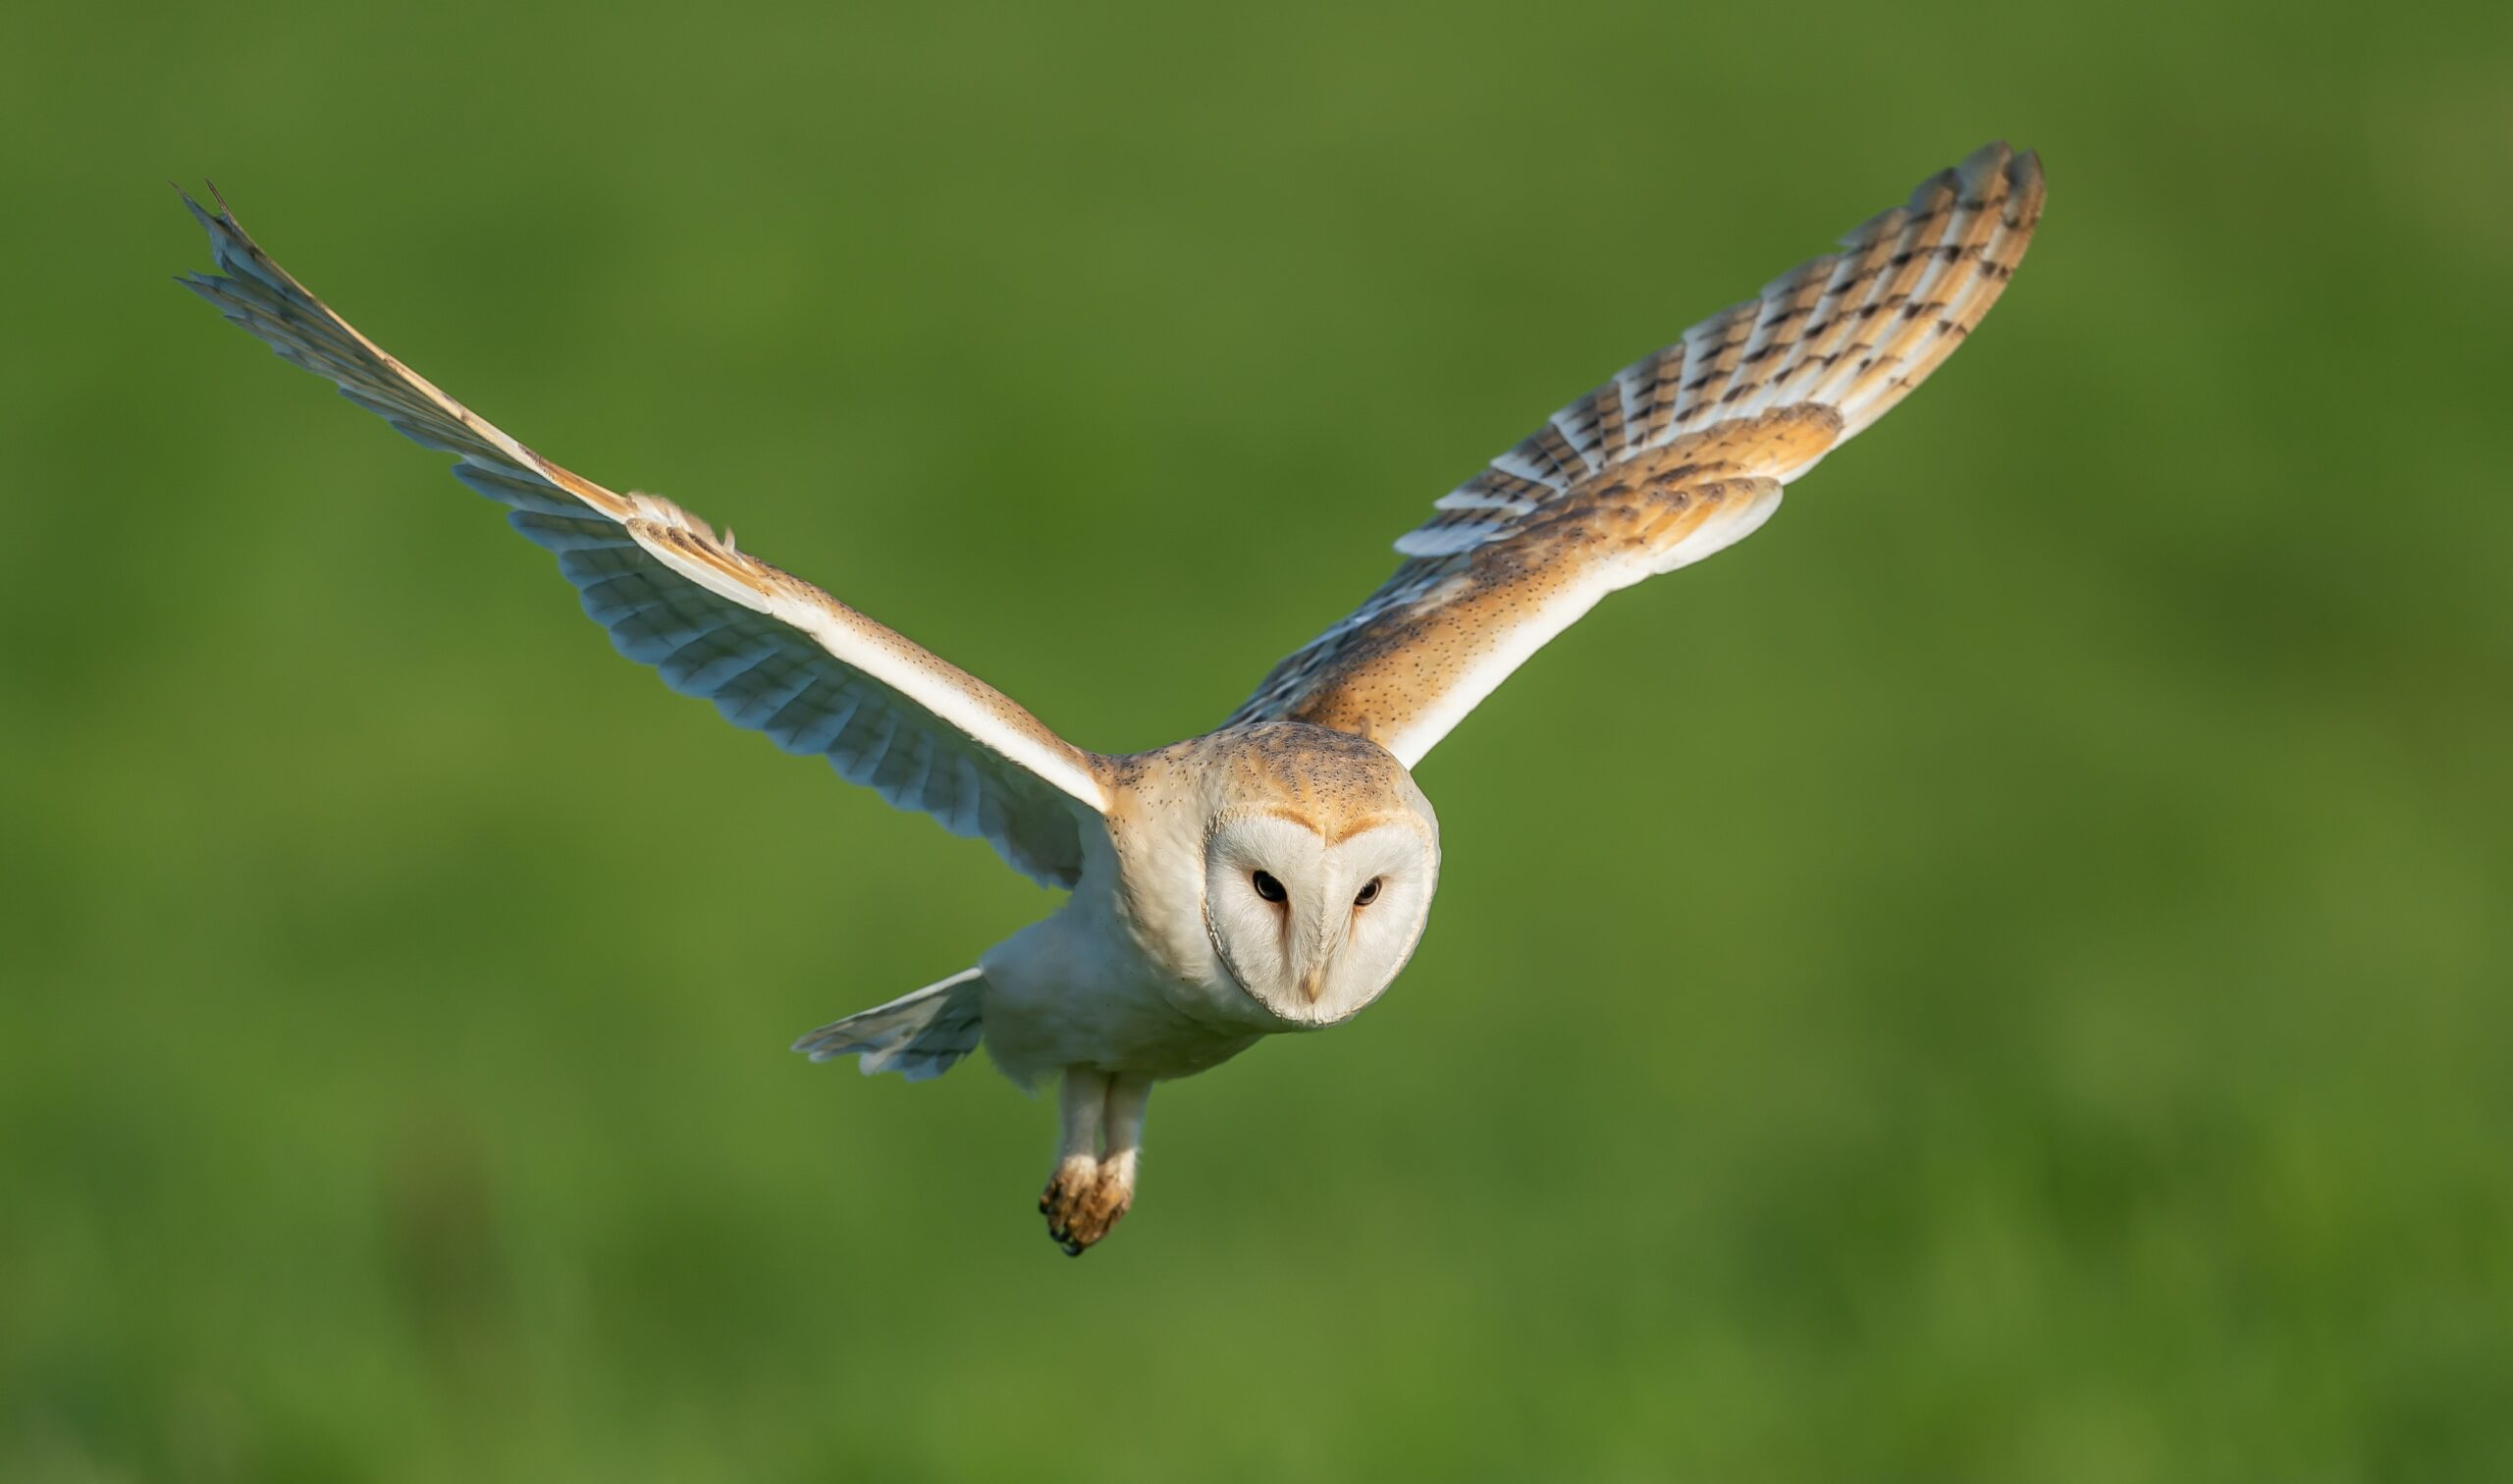 Barn owl hunting rat in Seattle suburb